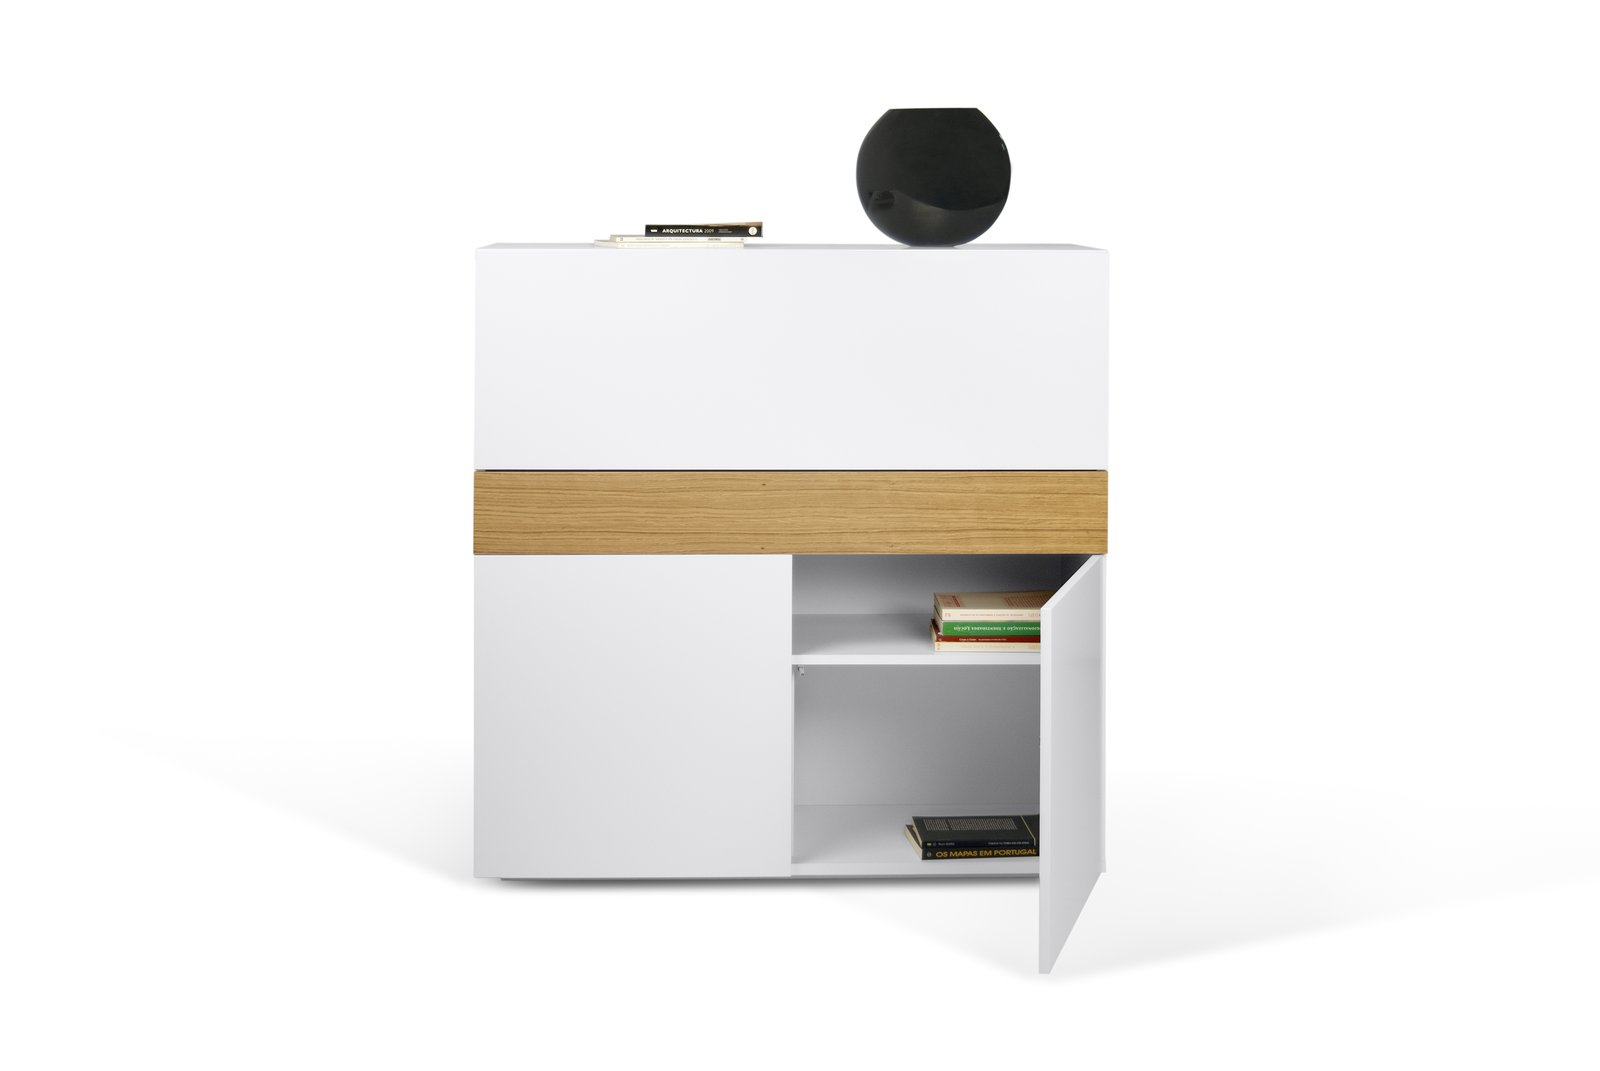 Secreter 9500052606 On Home Muebles Y Decoraci N Online # Muebles Secreter